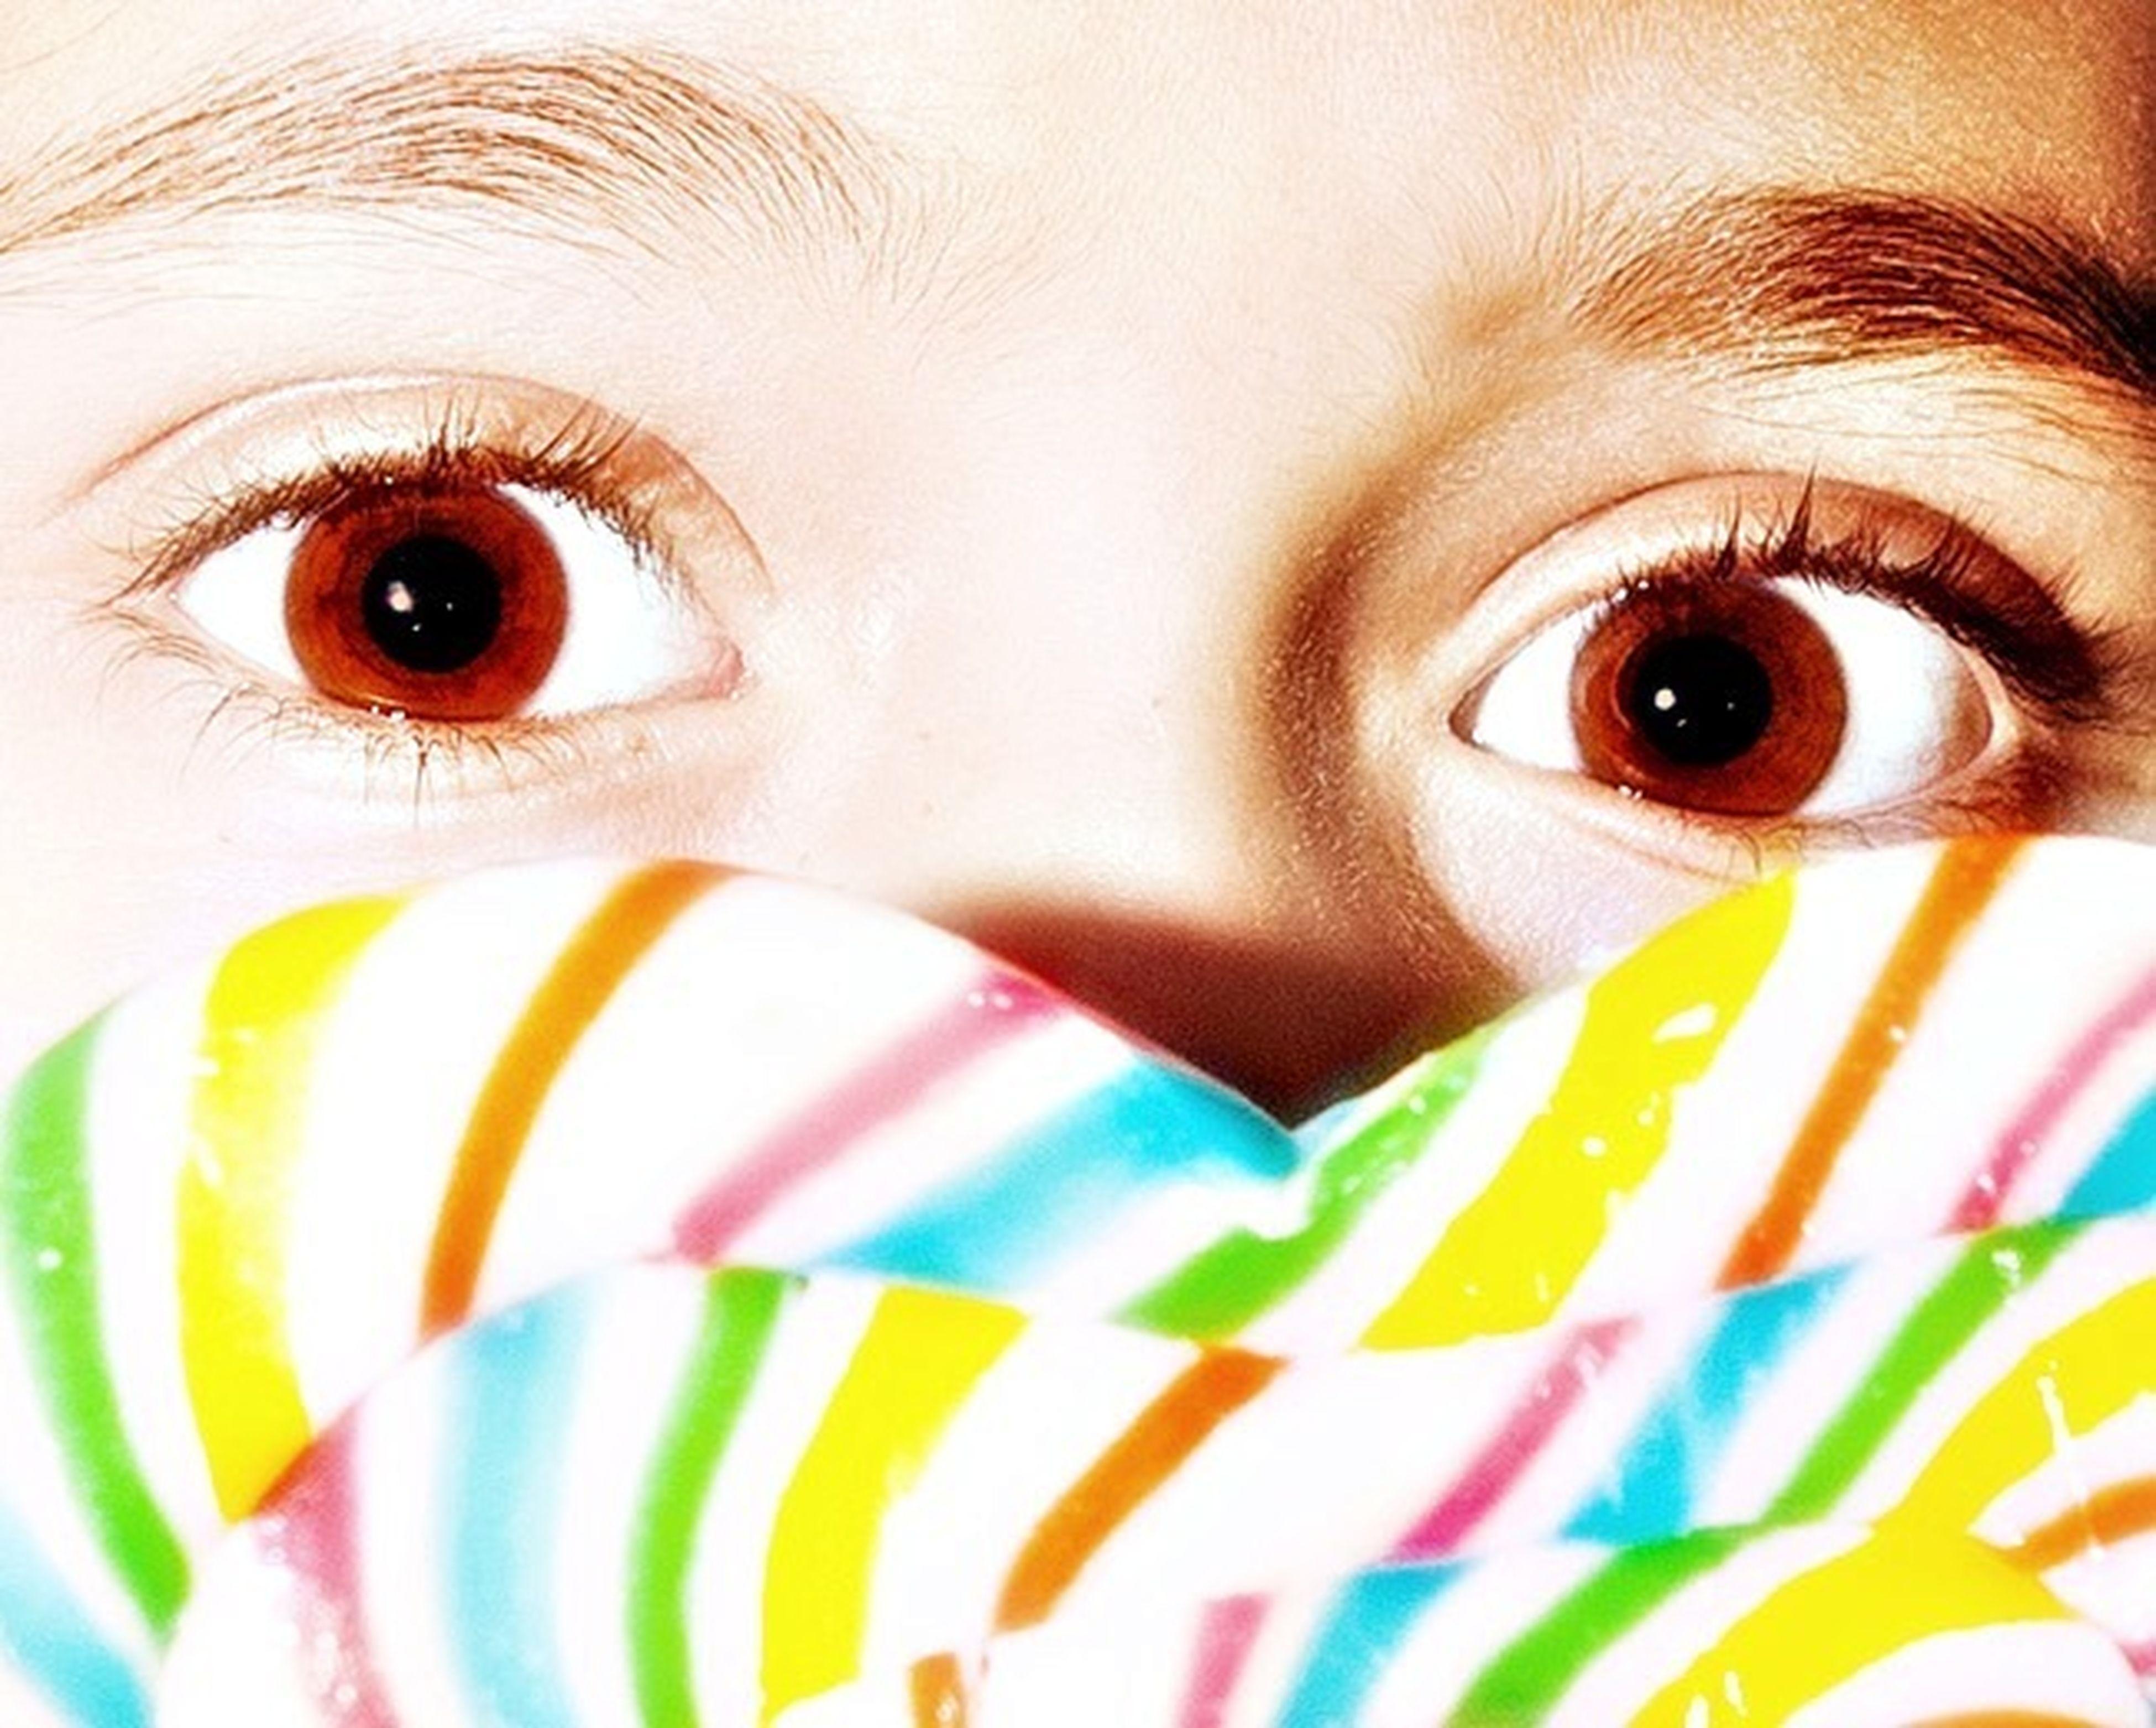 close-up, looking at camera, portrait, indoors, full frame, human eye, multi colored, backgrounds, childhood, detail, part of, cute, eyesight, eye, innocence, extreme close-up, eyelash